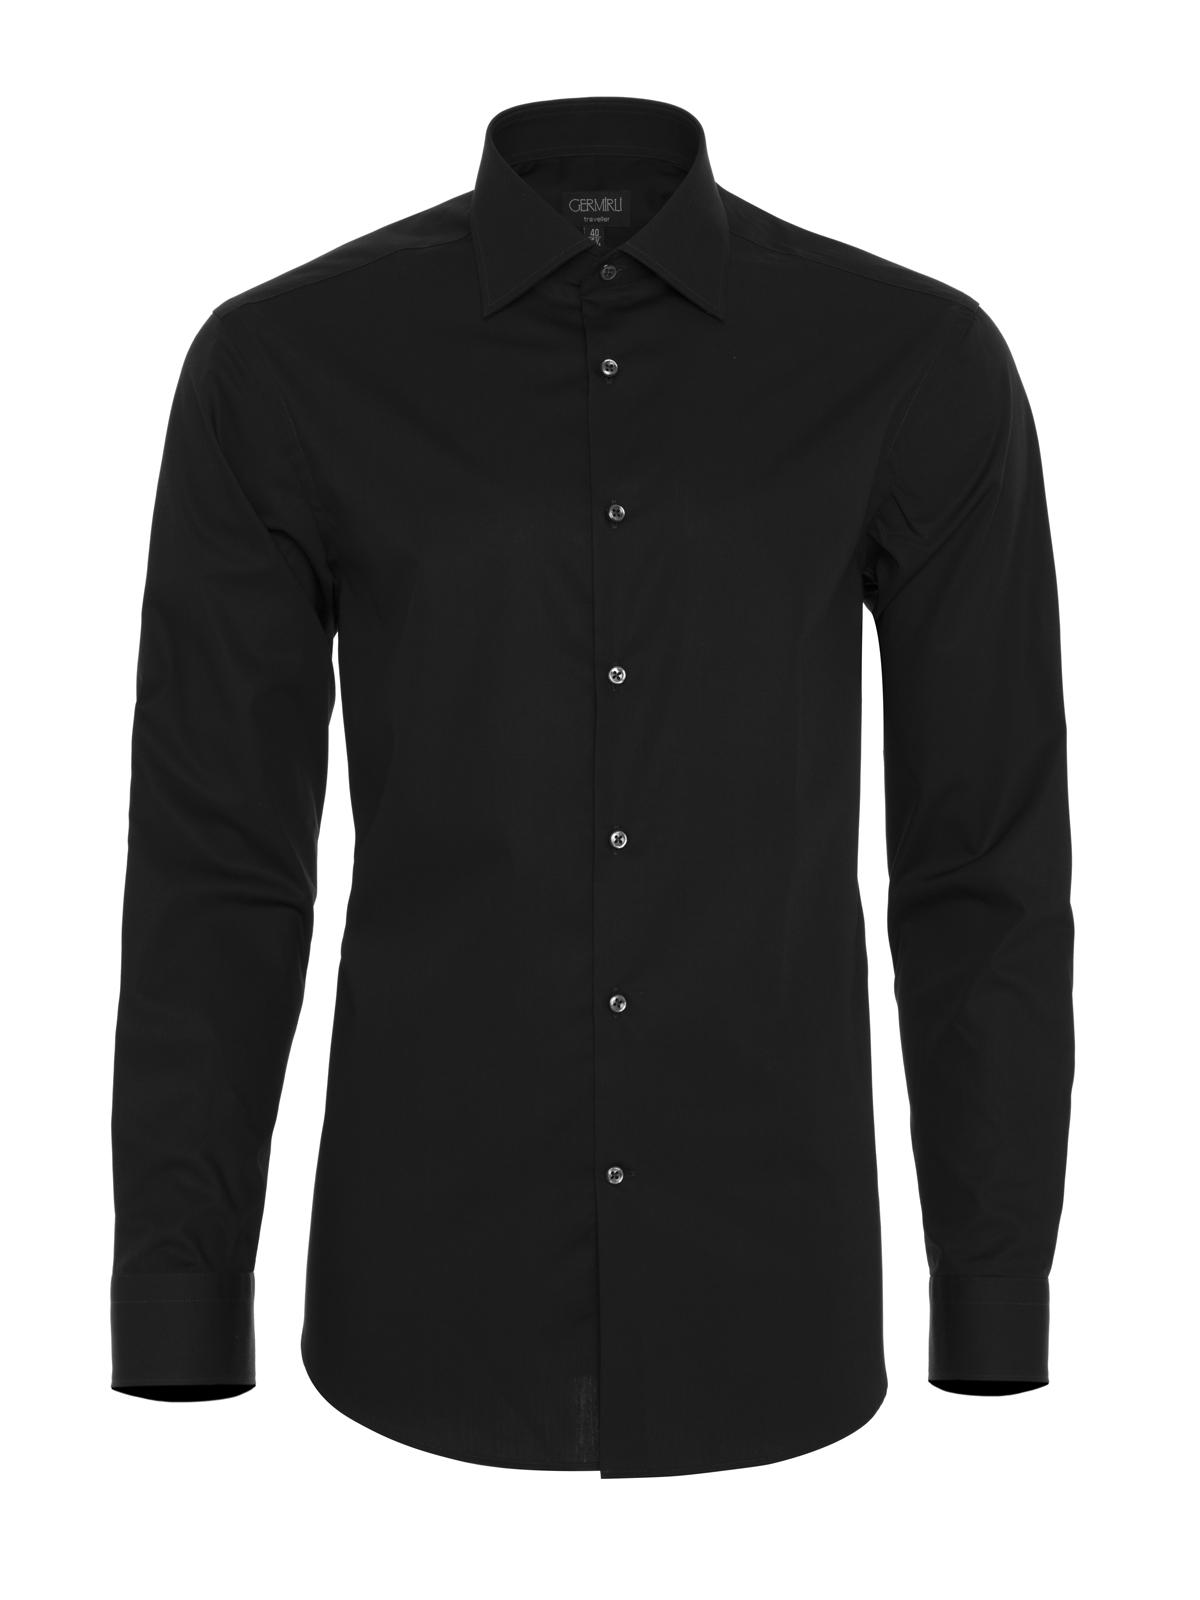 Germirli Non Iron Black Poplin Semi Spread Tailor Fit Shirt